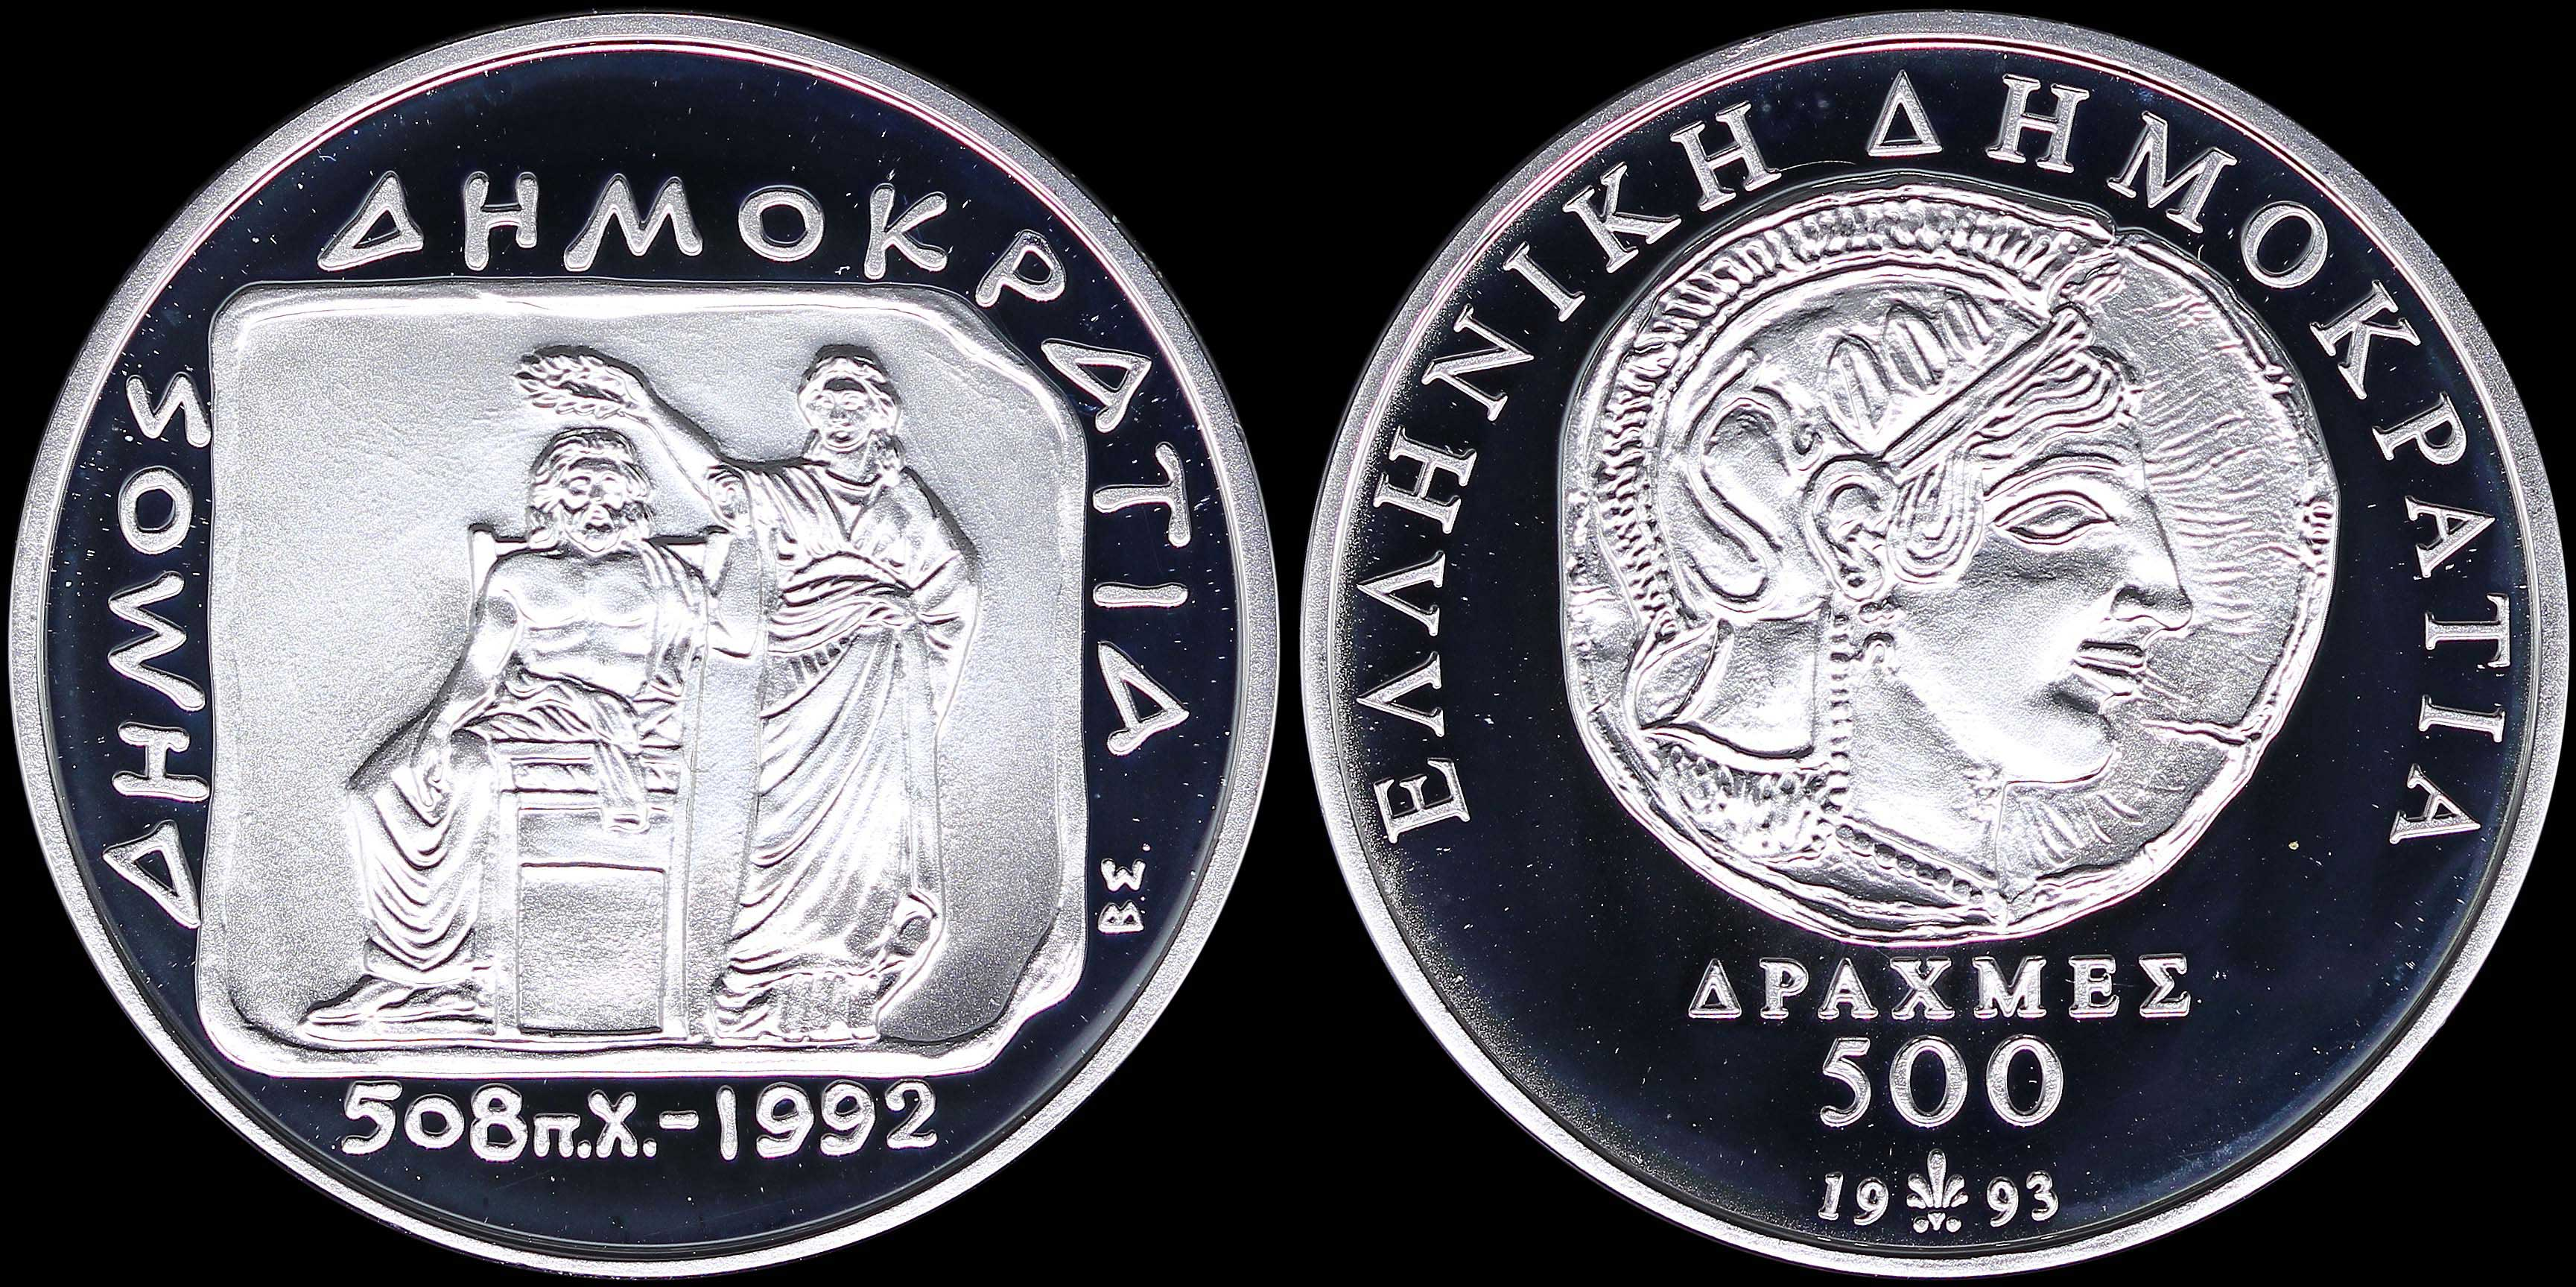 Lot 6229 - -  COINS & TOKENS HELLENIC REPUBLIC & COMMEMORATIVE ISSUES -  A. Karamitsos Public & Live Internet Auction 682 (Part A) Coins, Medals & Banknotes